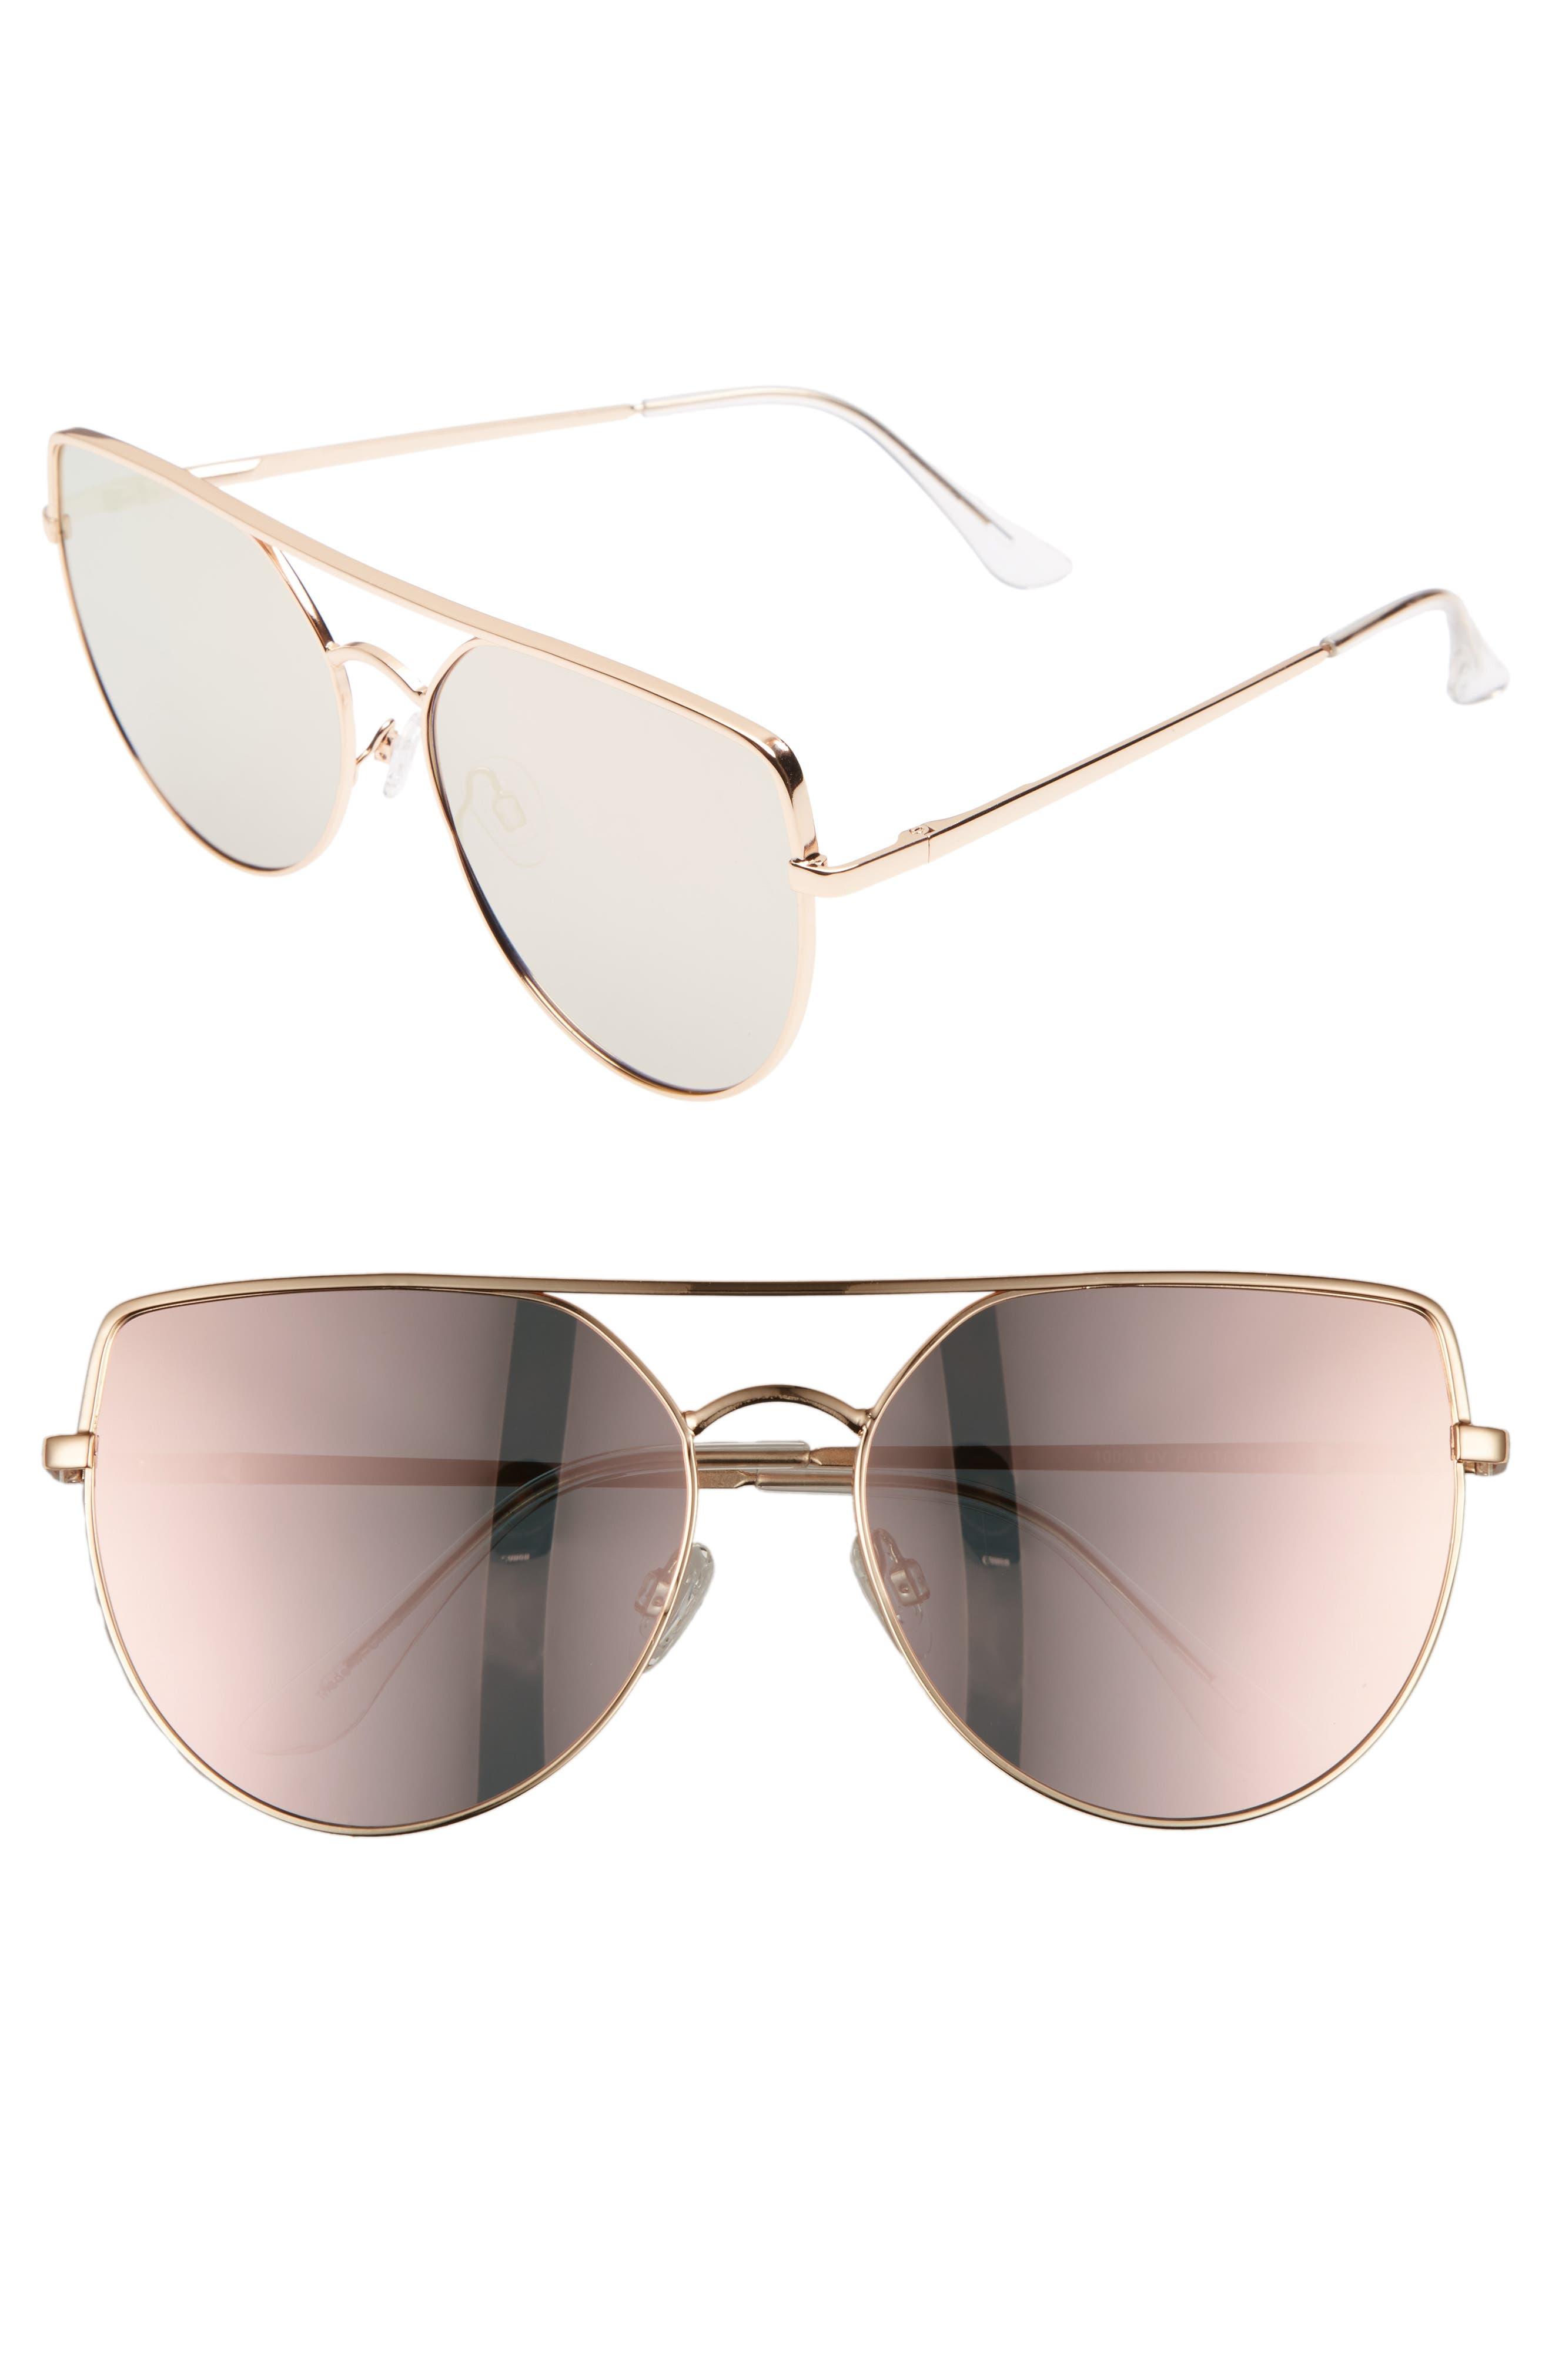 60mm Aviator Sunglasses,                             Main thumbnail 1, color,                             220